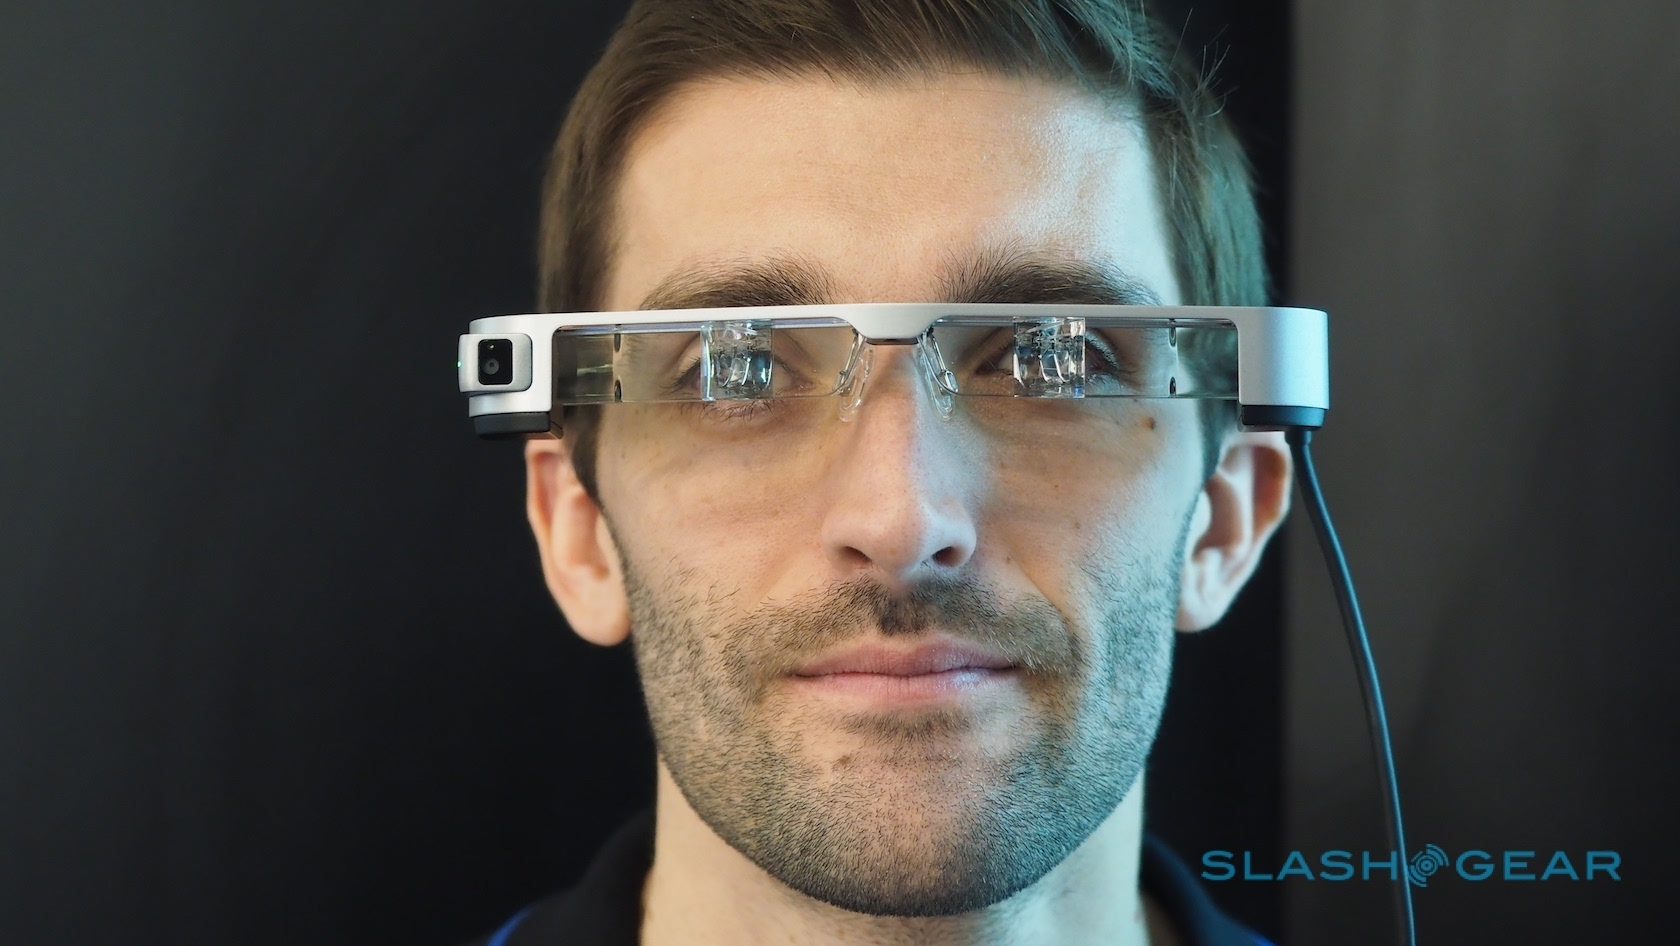 bt无码动物下载_爱普生 moverio bt-300 智能眼镜 mwc2016 现场试玩